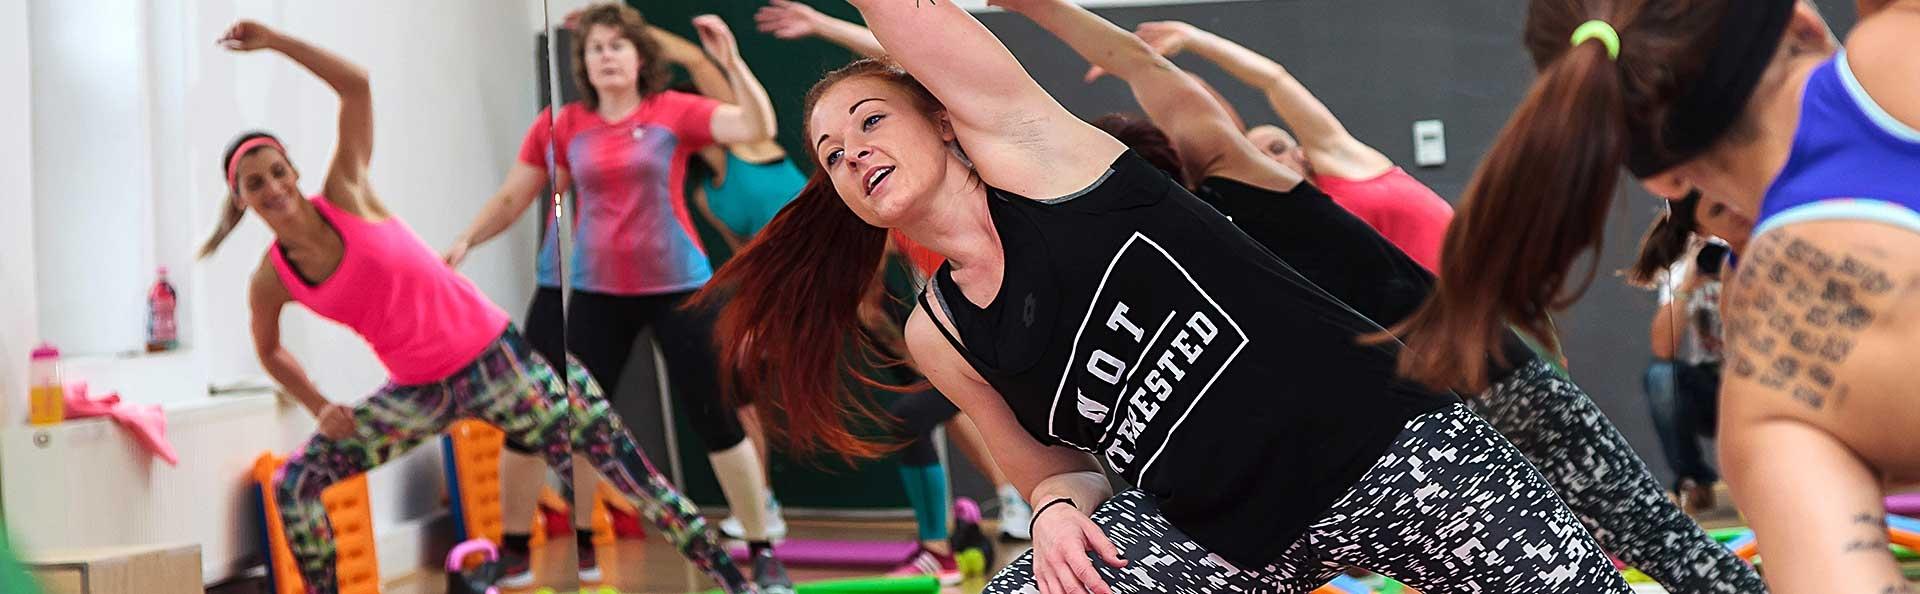 Fitness aktivity